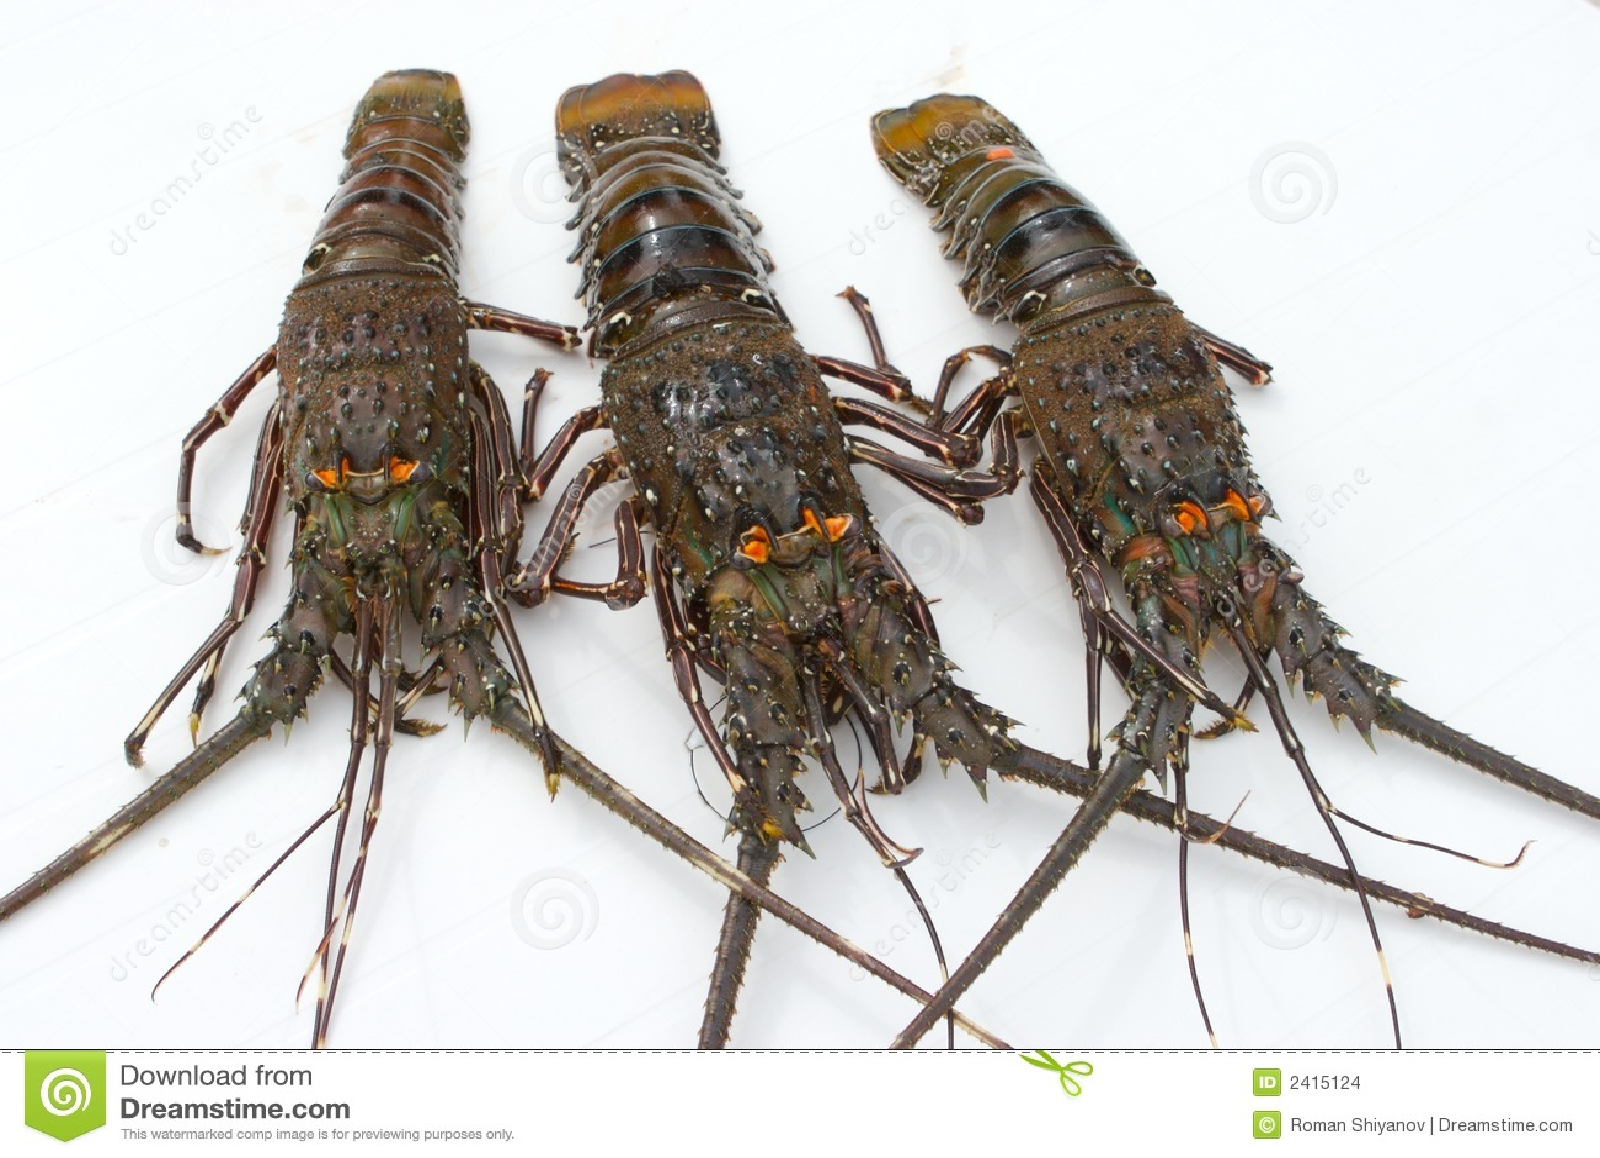 Tree lobsters stock photo. Image of dainty, bite, antenna - 2415124